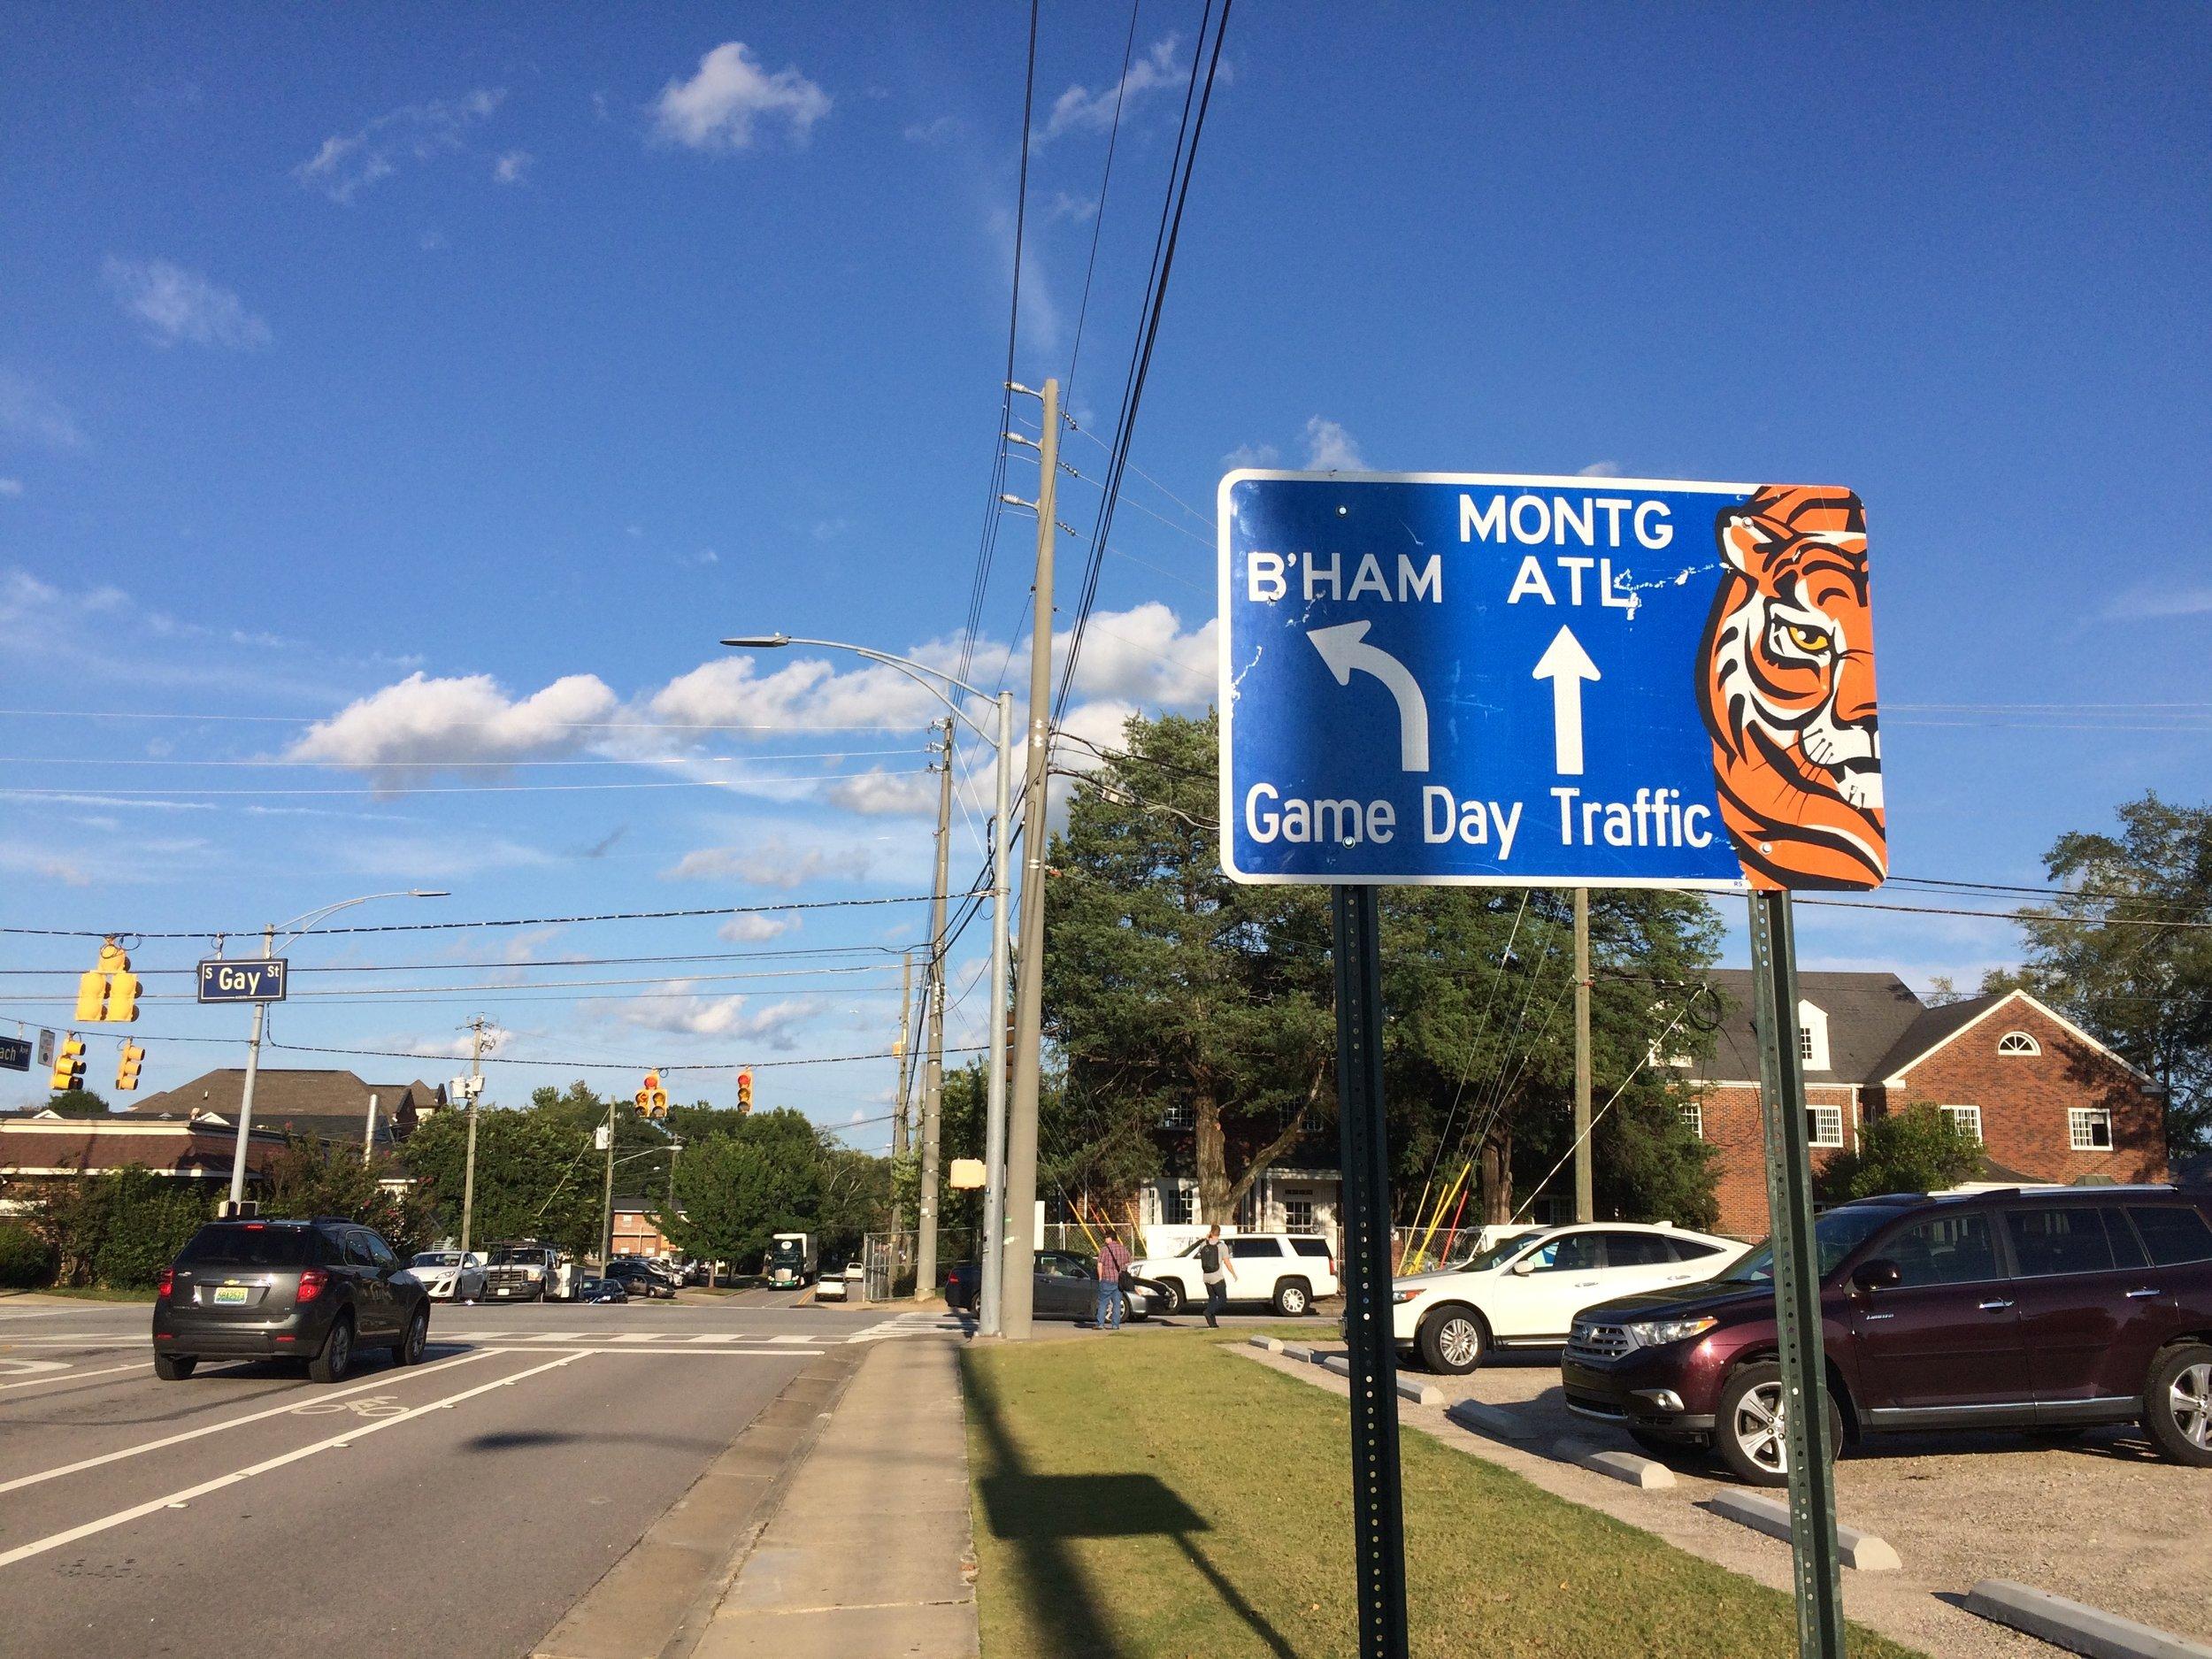 Football season tourism is a mainstay of Auburn's economy.